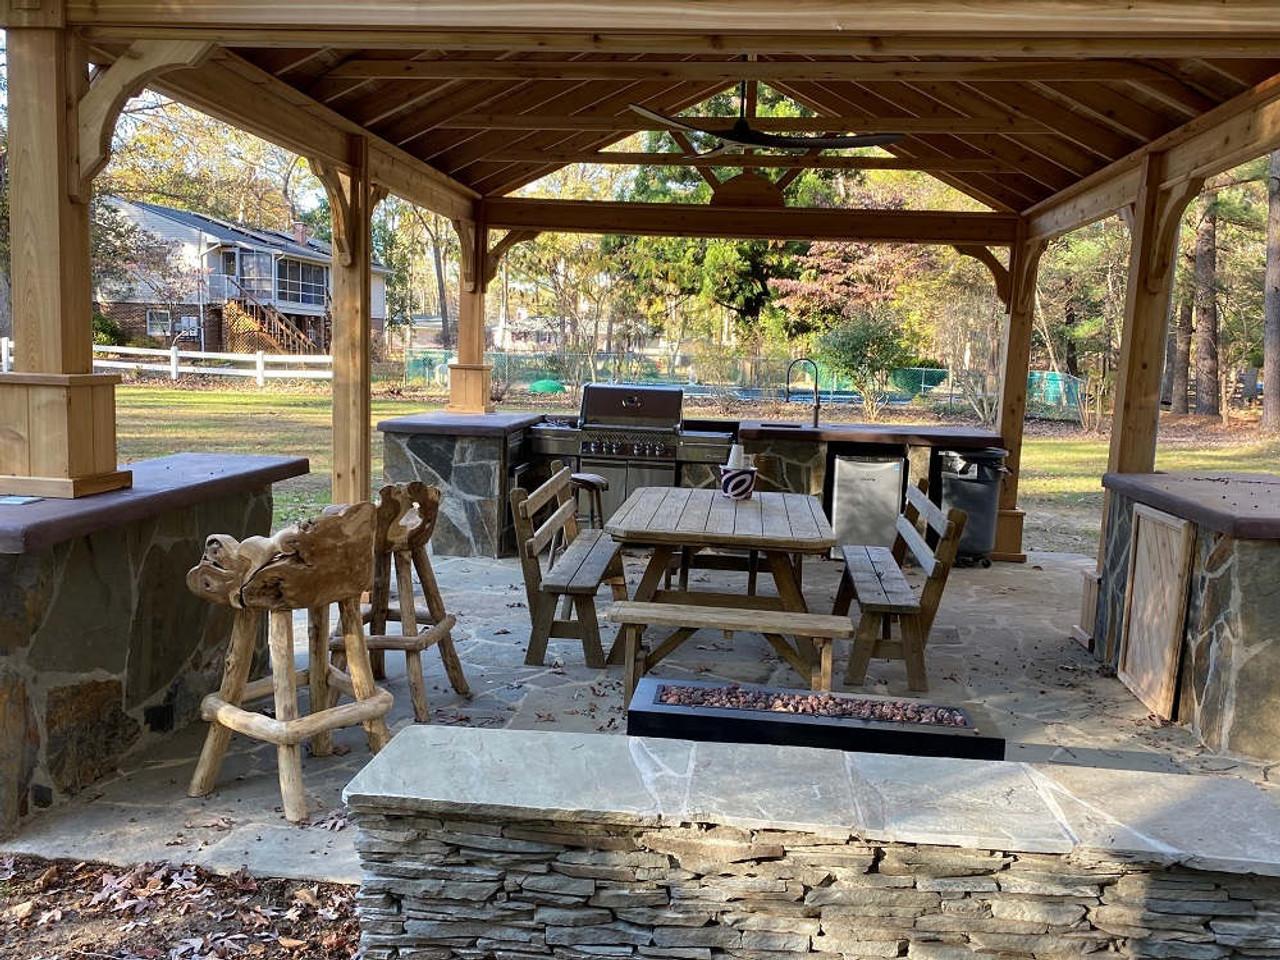 16x20 Red Cedar Gable Roof Pavilion Kit with beautiful teak stools, White Plains, MD